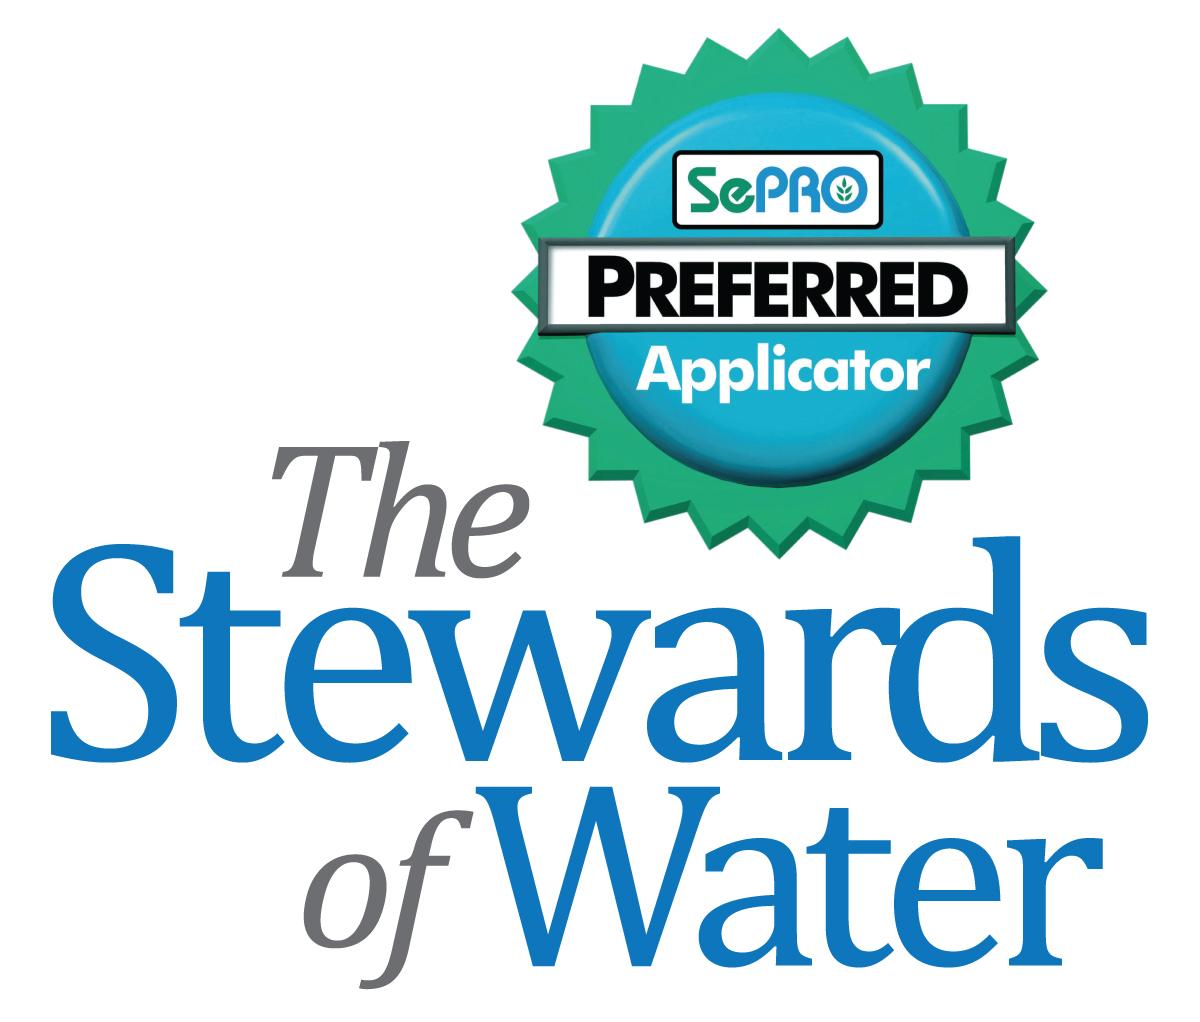 SePRO_Stewards_of_Water_logo-1